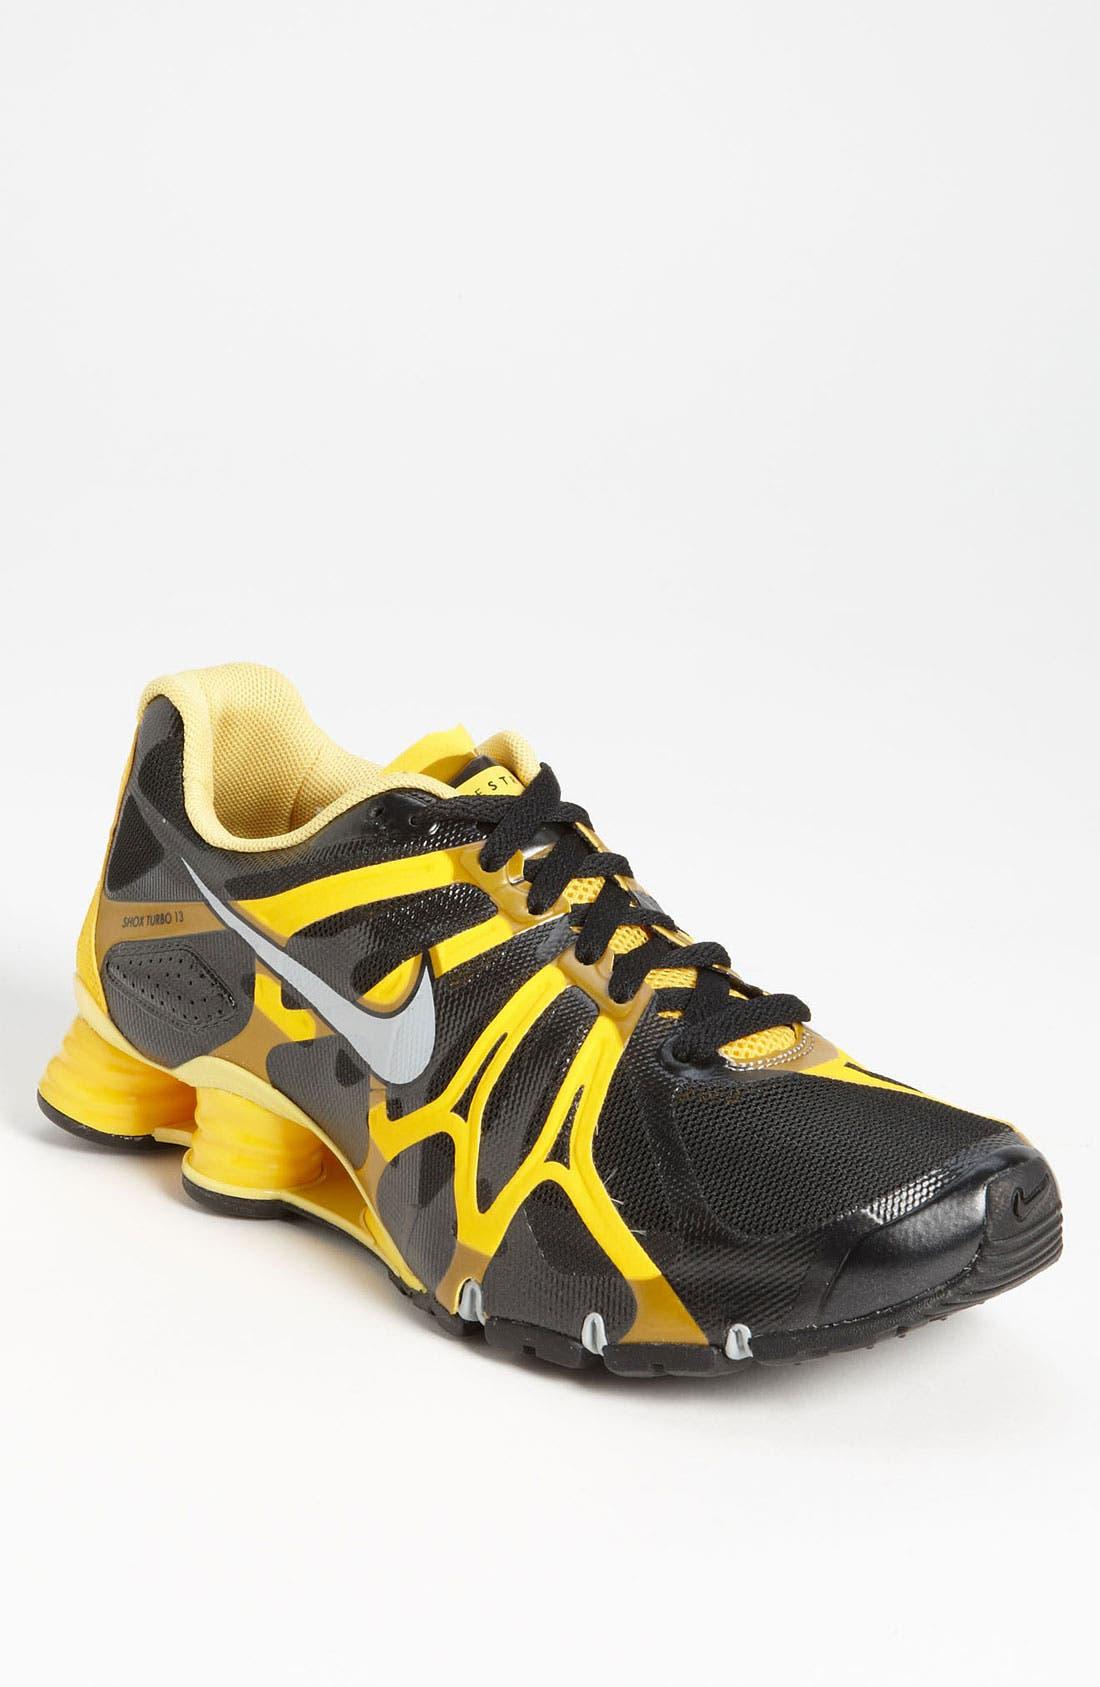 'LIVESTRONG Shox Turbo+ 13' Running Shoe, Main, color, 001